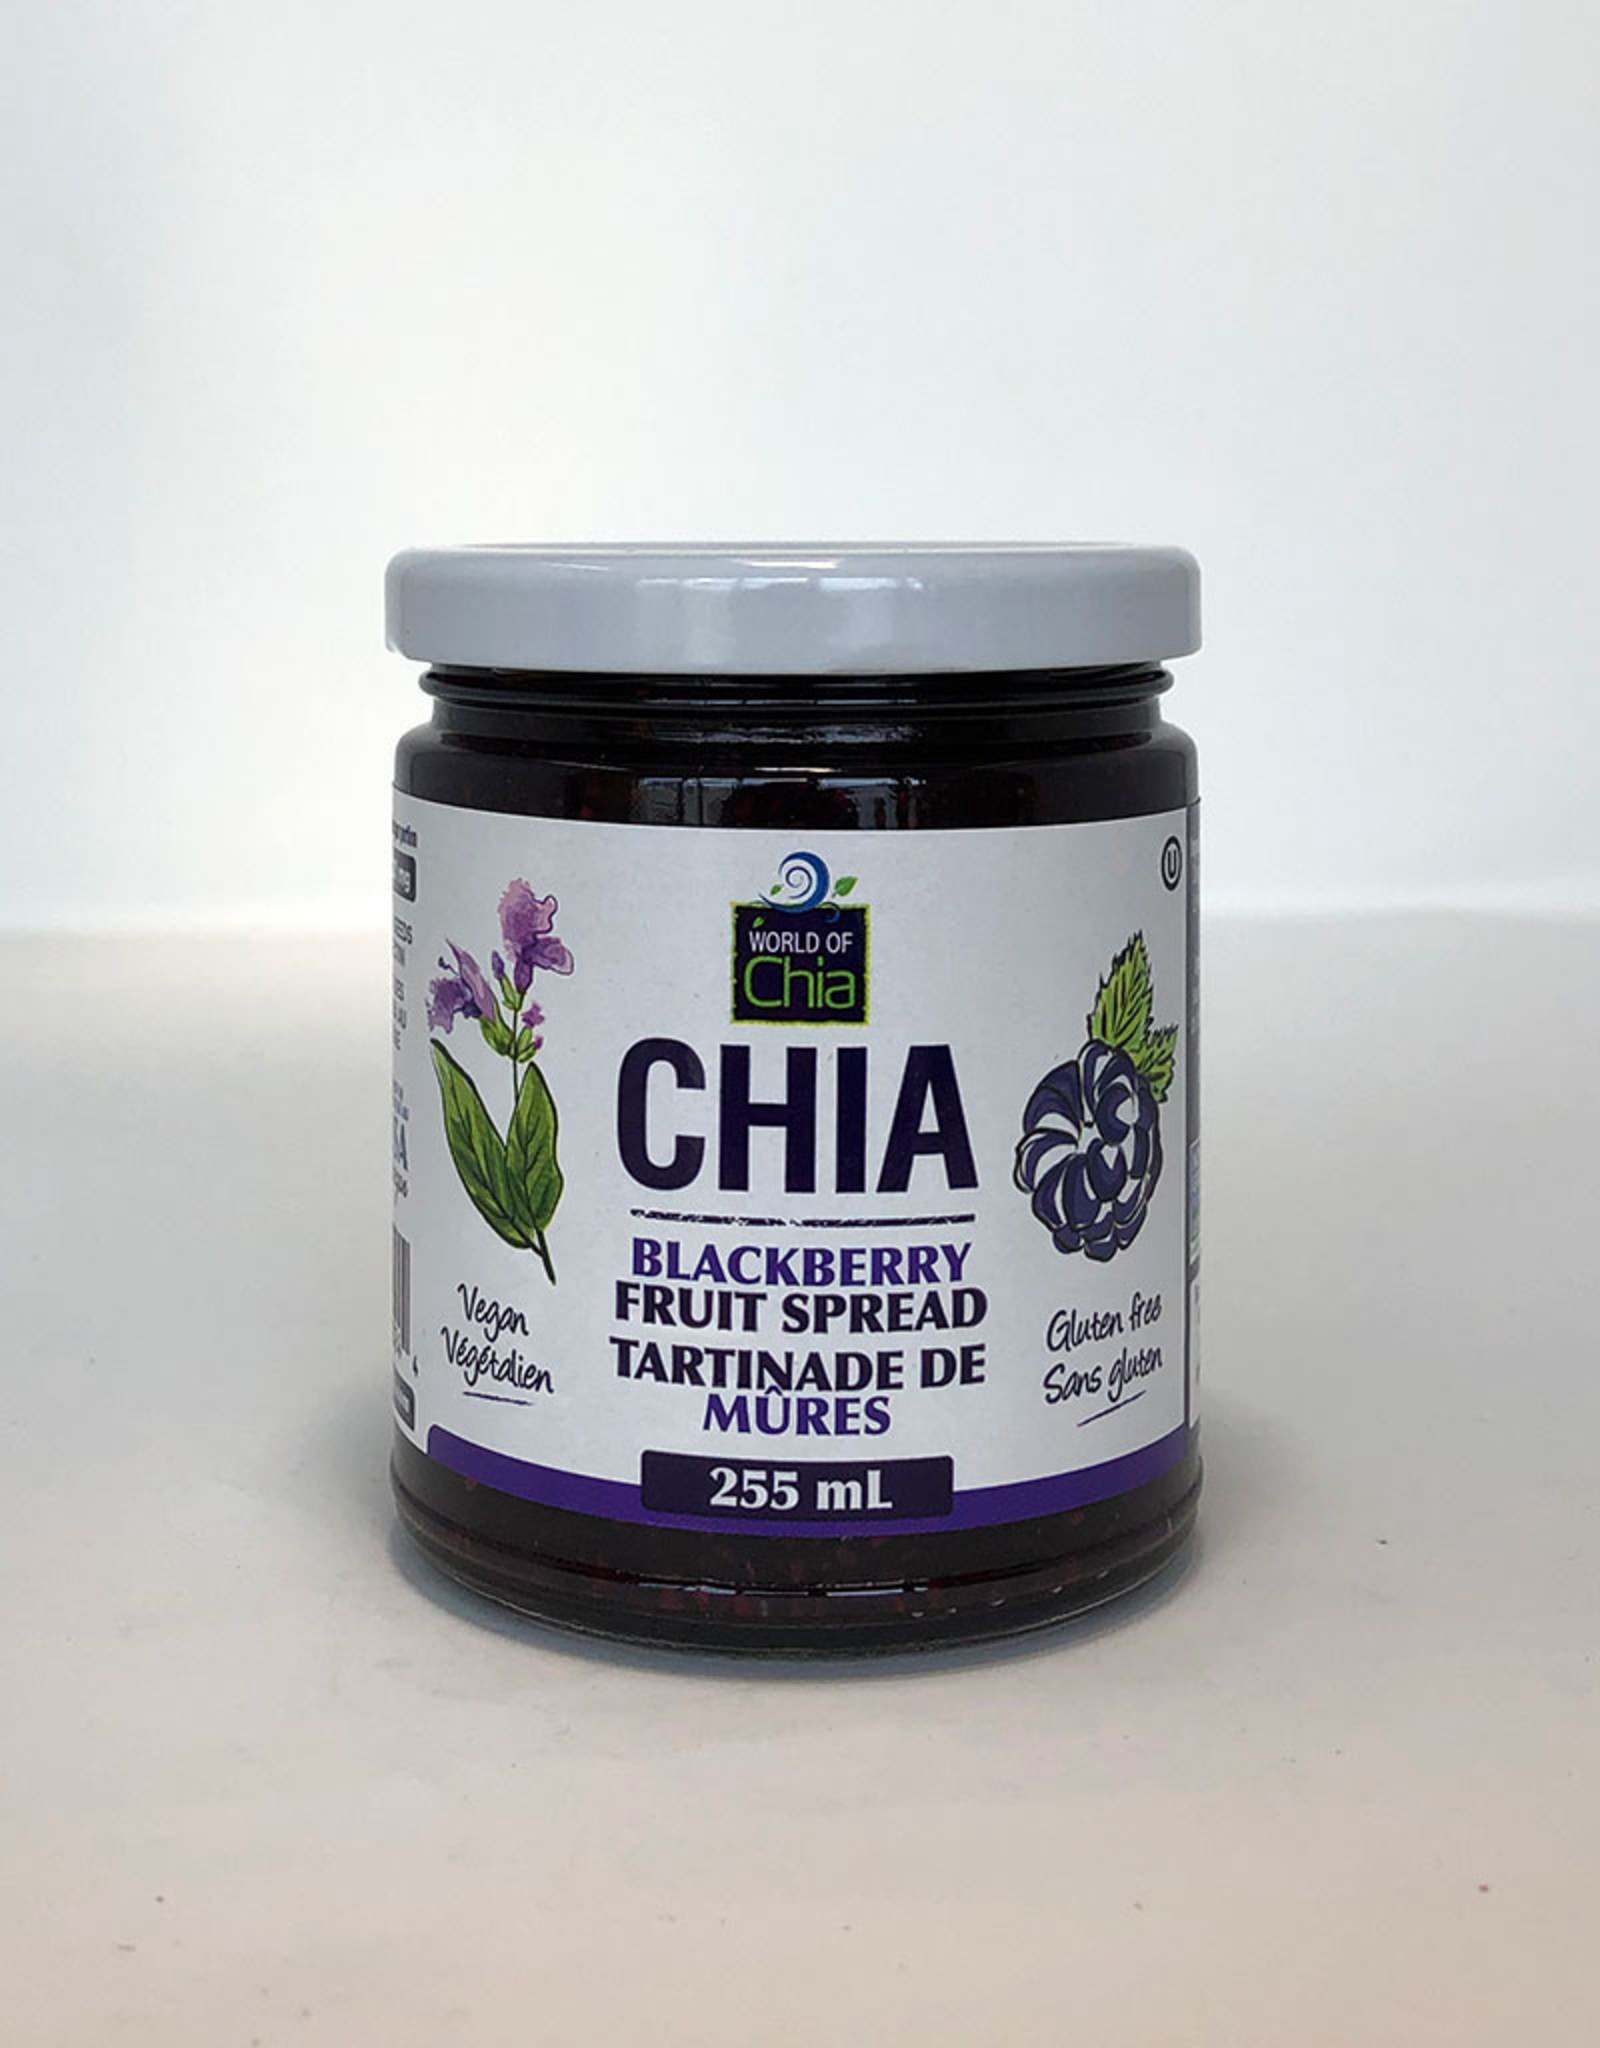 World of Chia World of Chia - Chia Jam Spread, Blackberry (255ml)